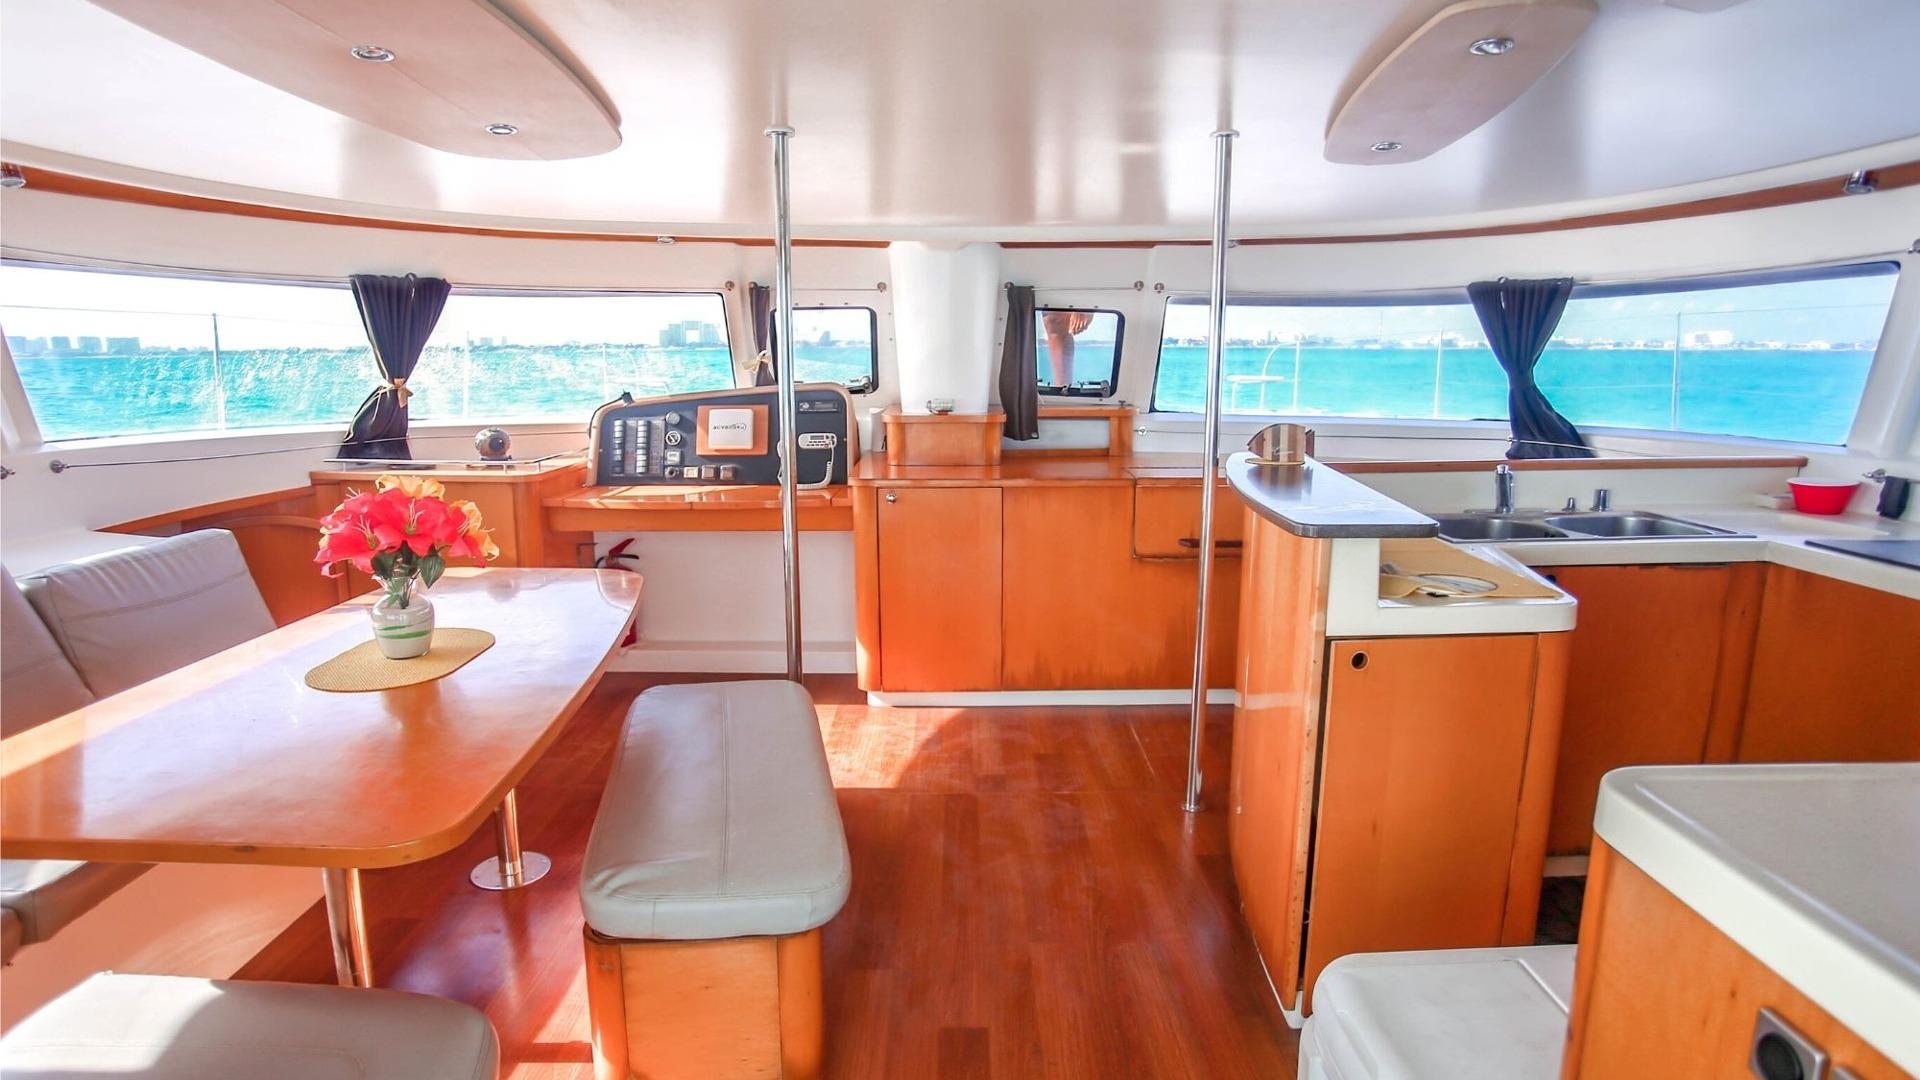 1 - LowRes Megaira- Private tour to Isla Mujeres in catamaran - Cancun Sailing